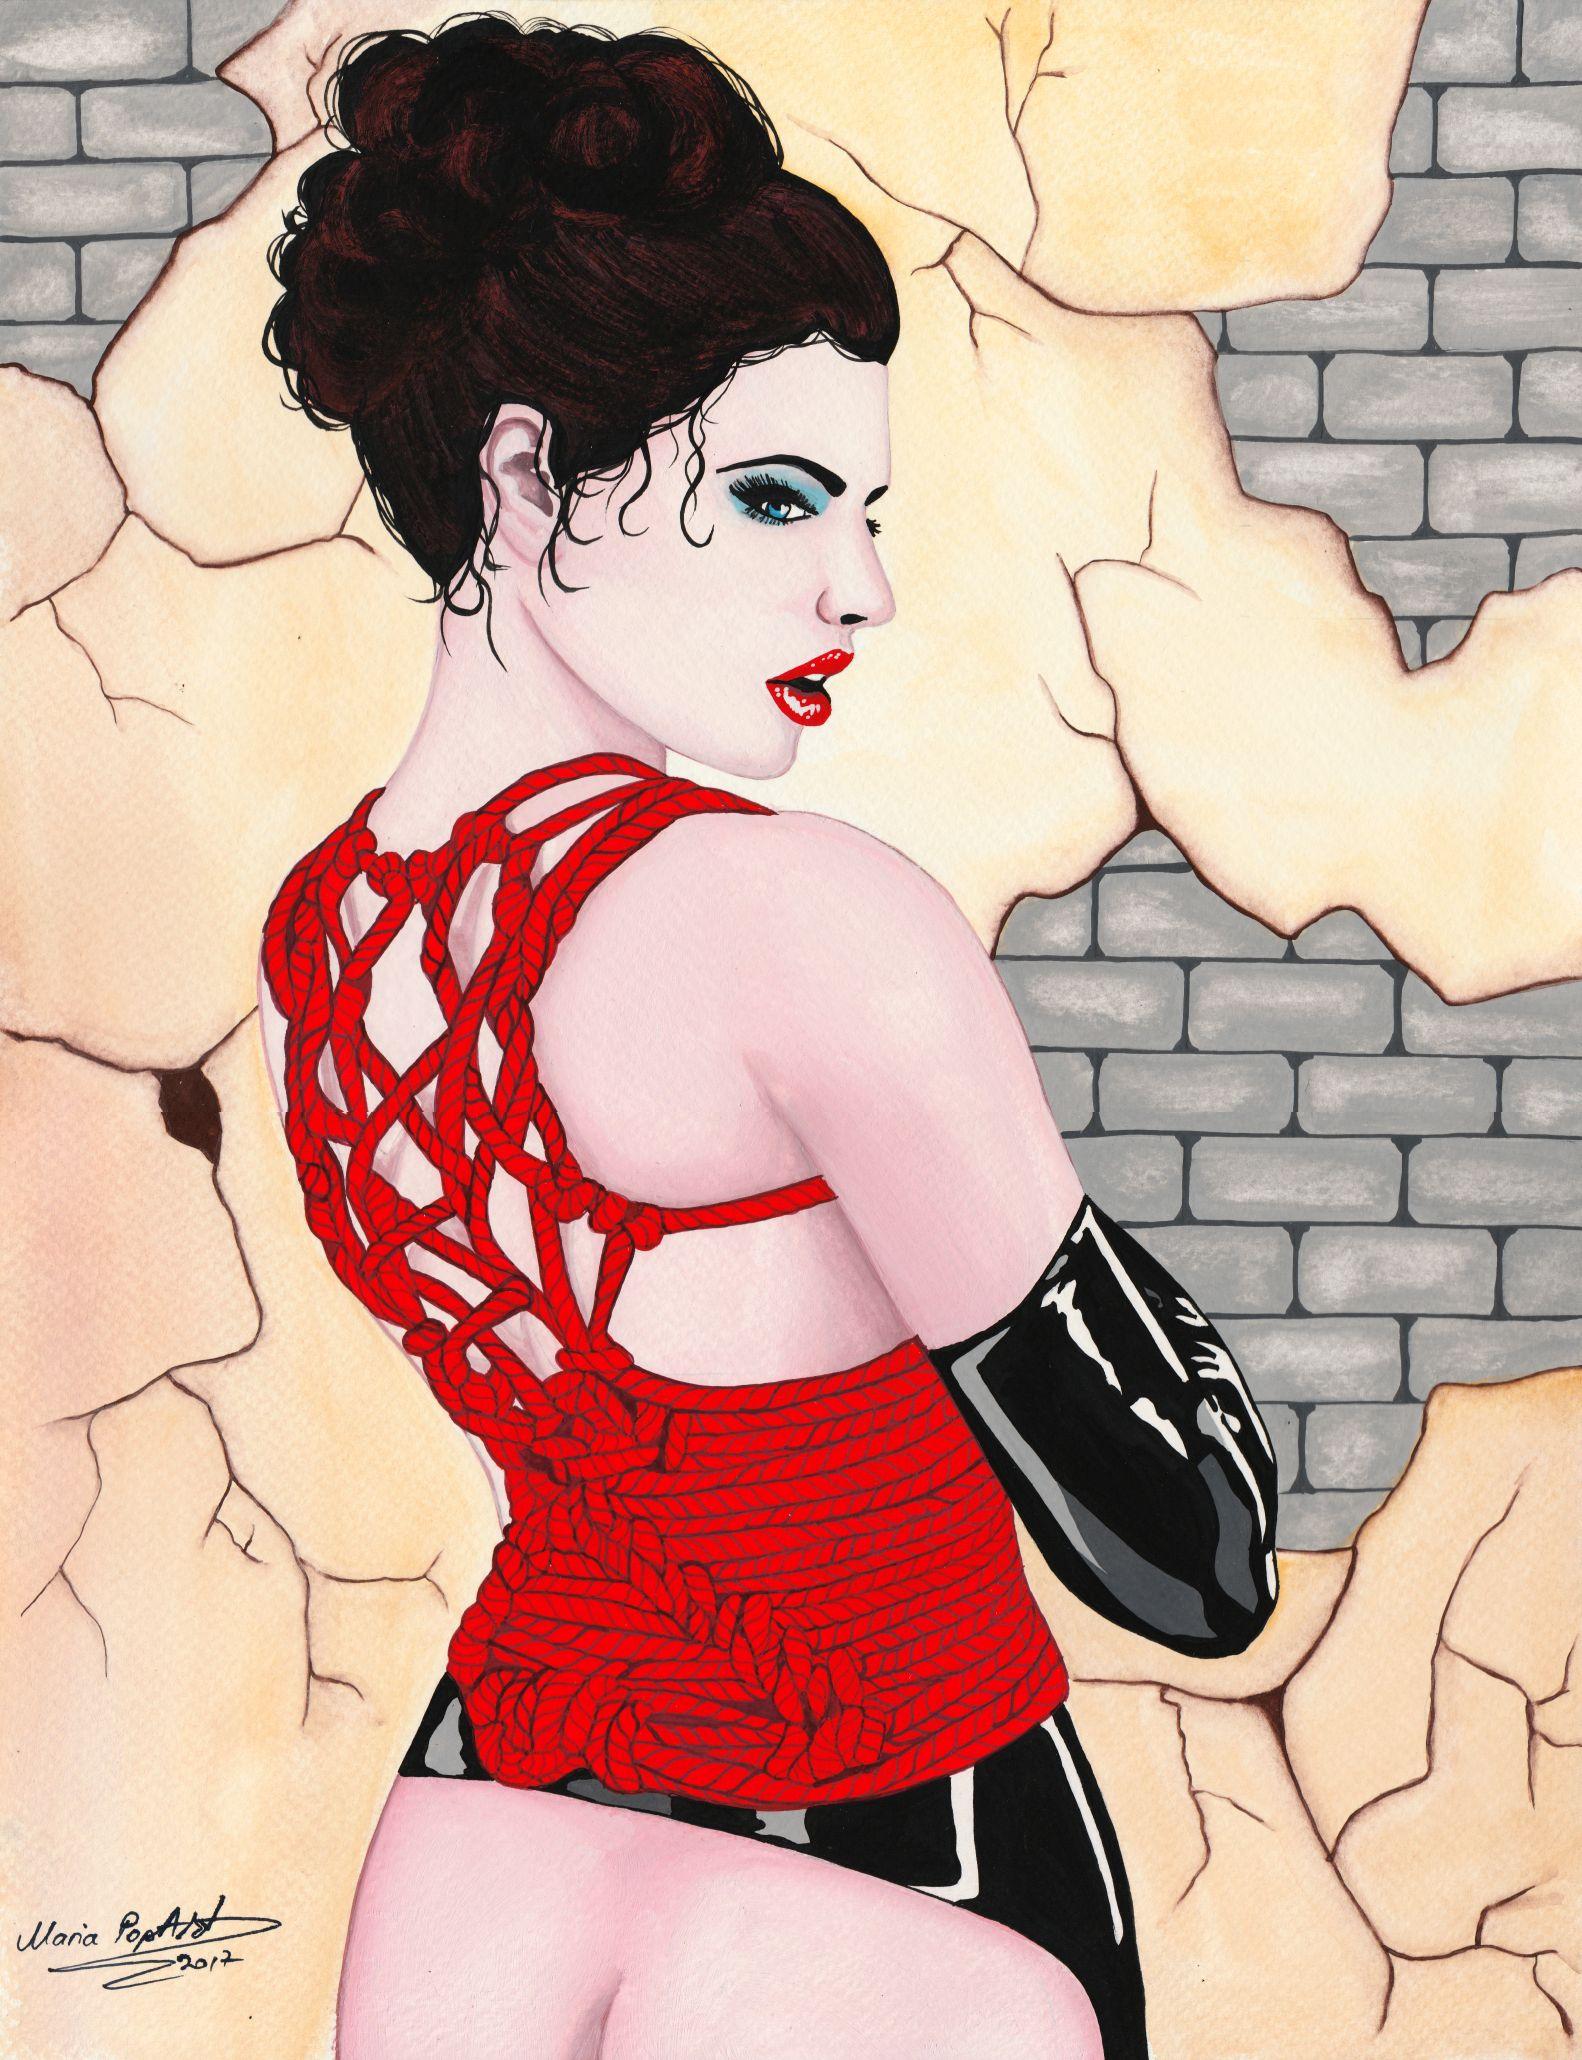 code-0039-rope-corset-27-x-35-cm-watercolor-by-maria-marcu